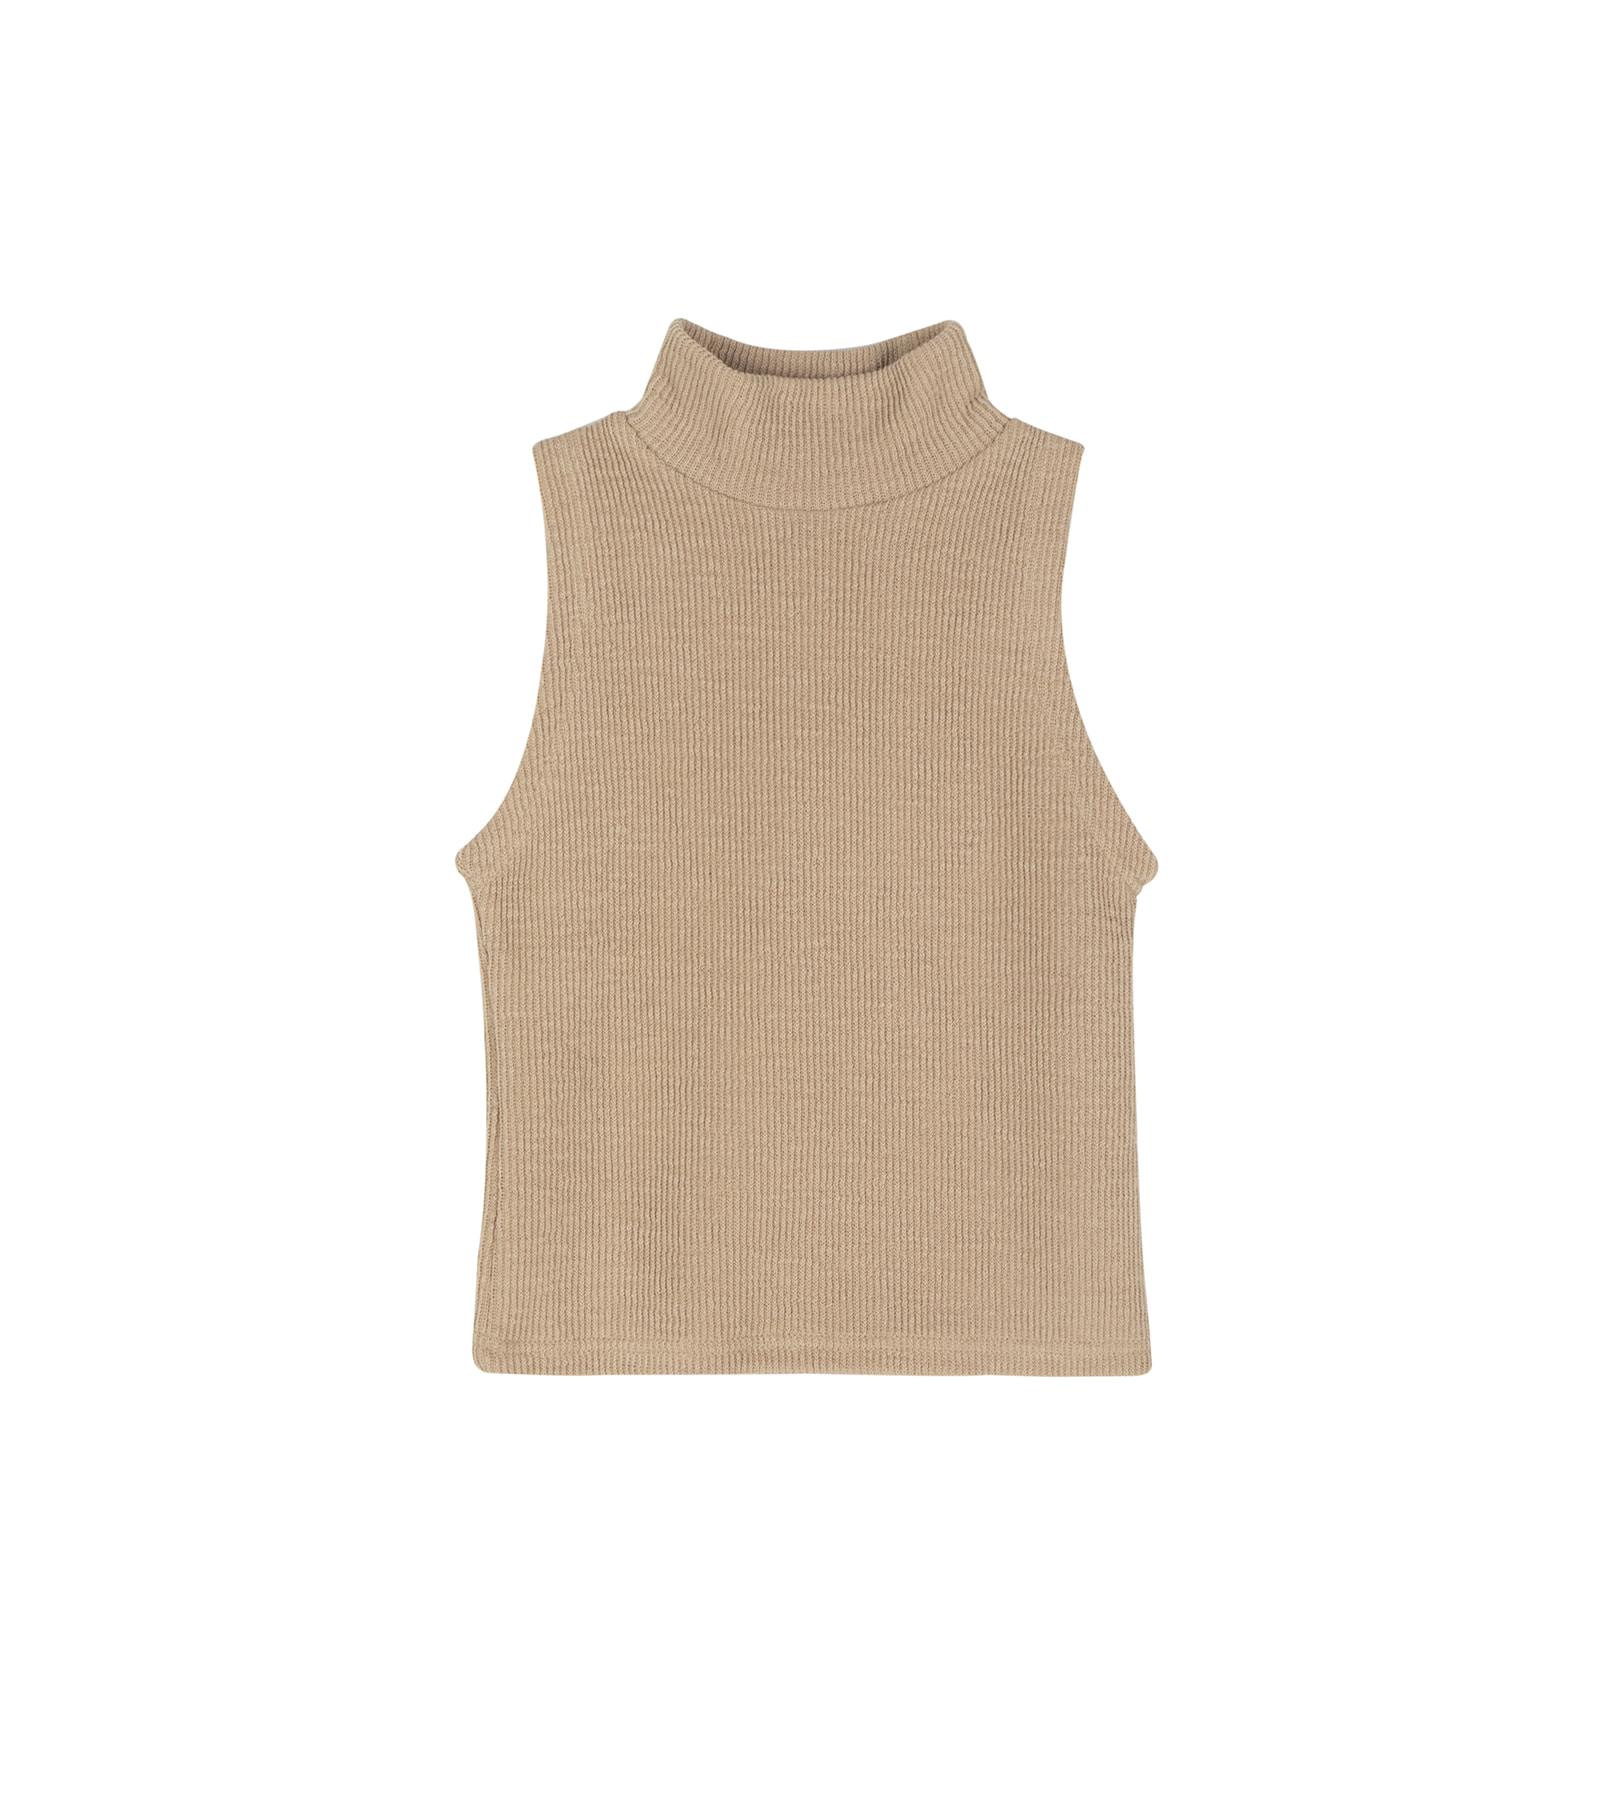 Matilda turtleneck sleeveless set top